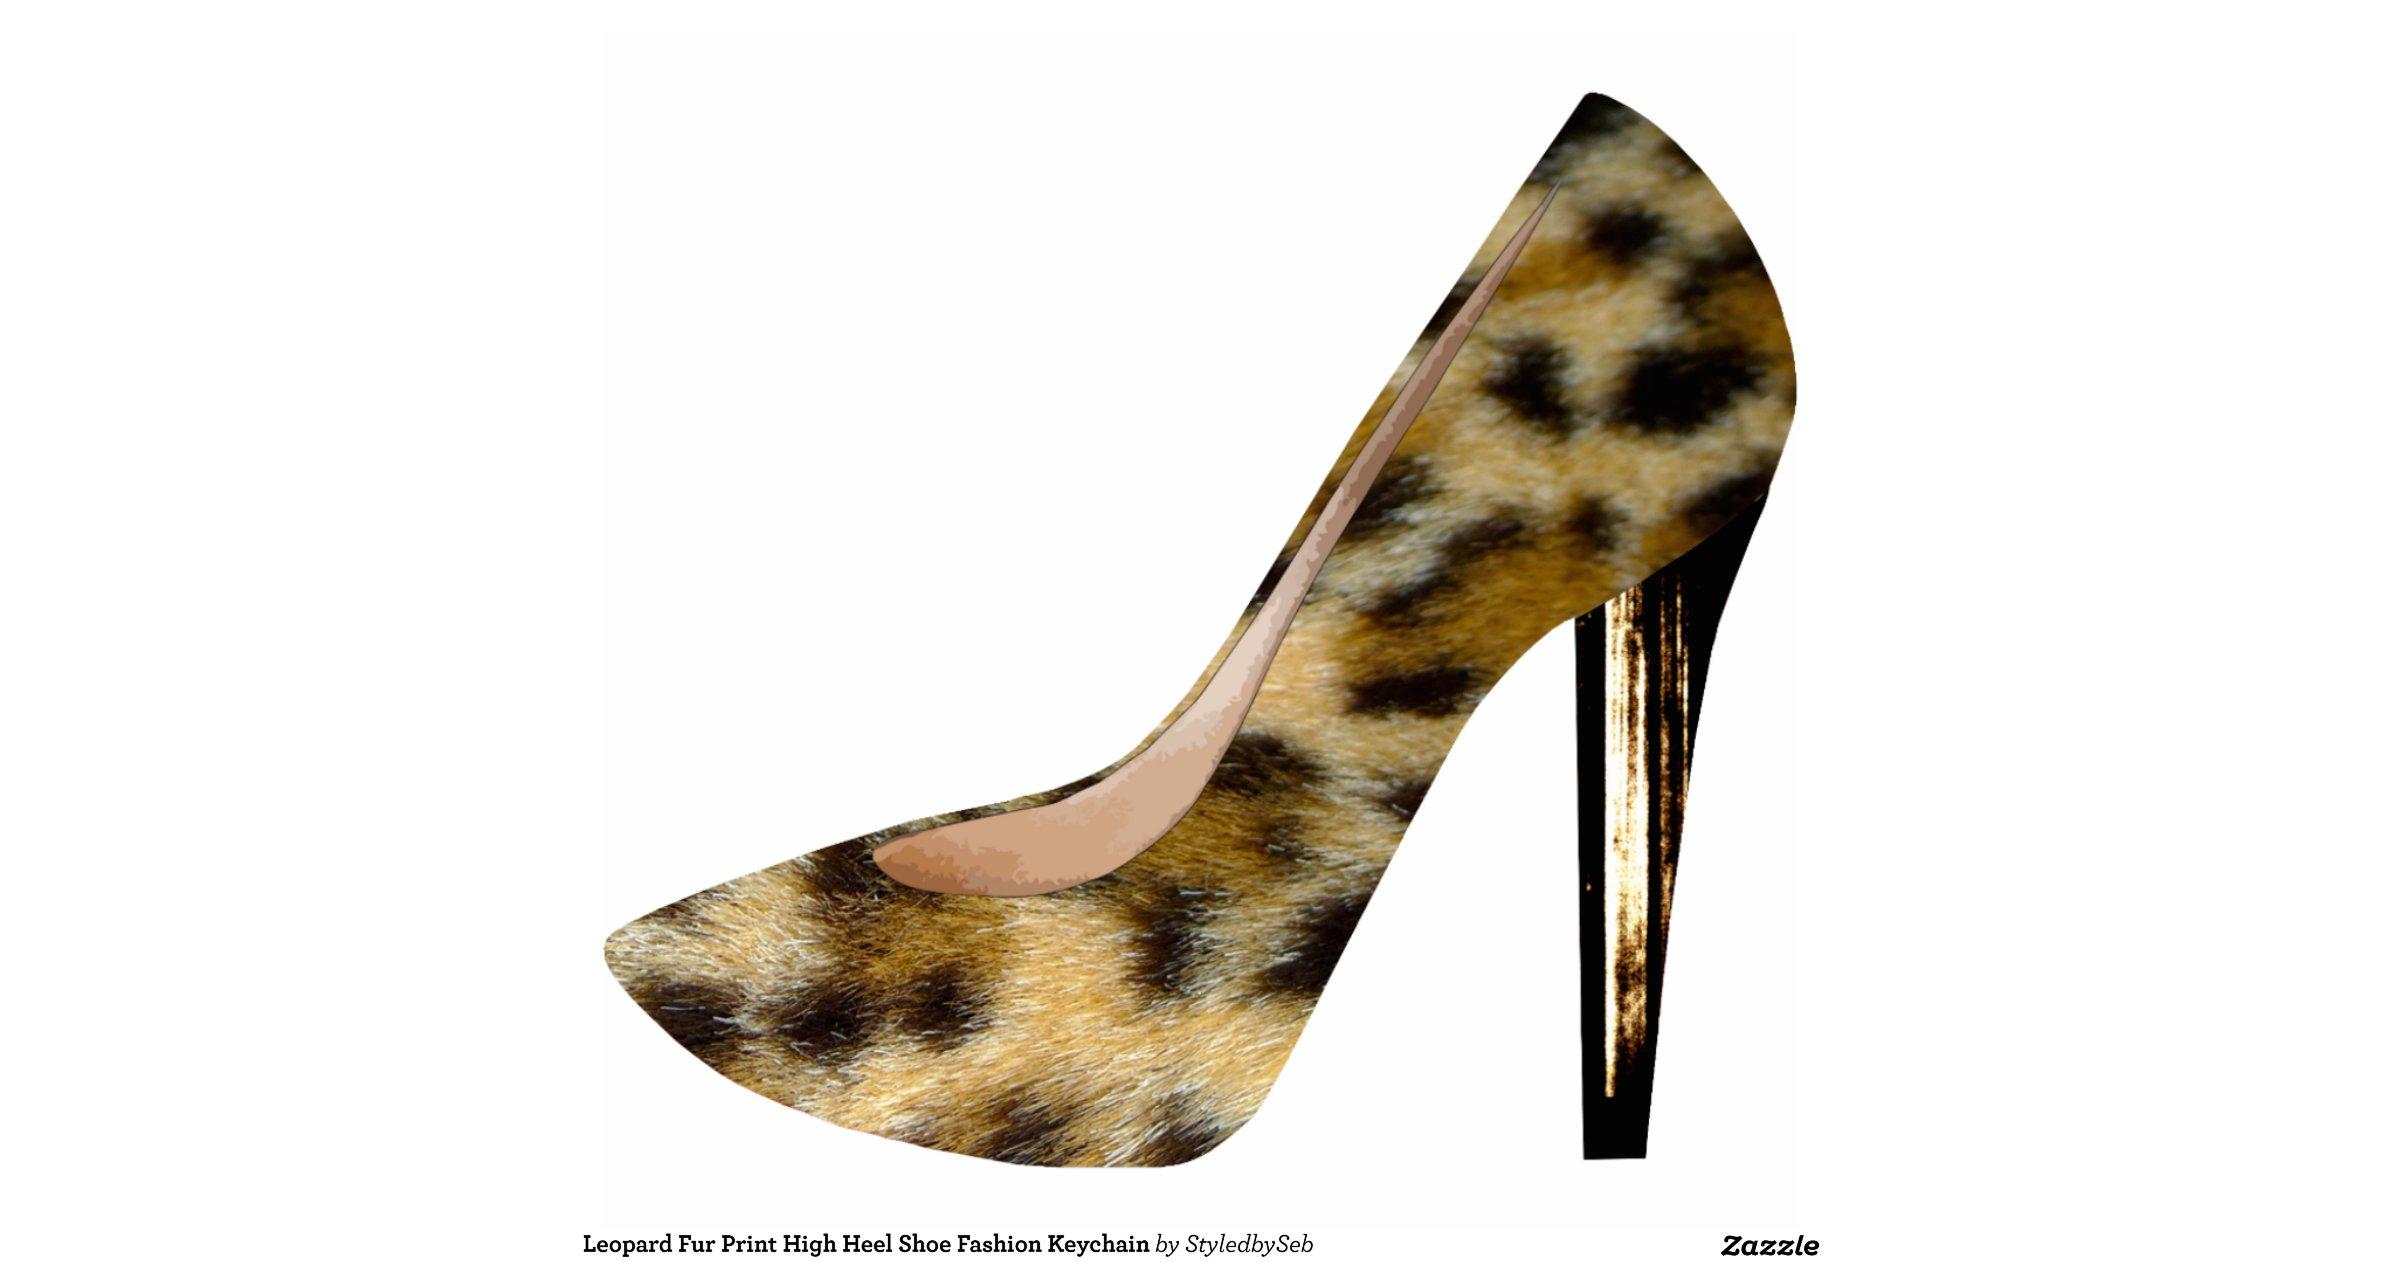 leopard fur print high heel shoe fashion keychain photo